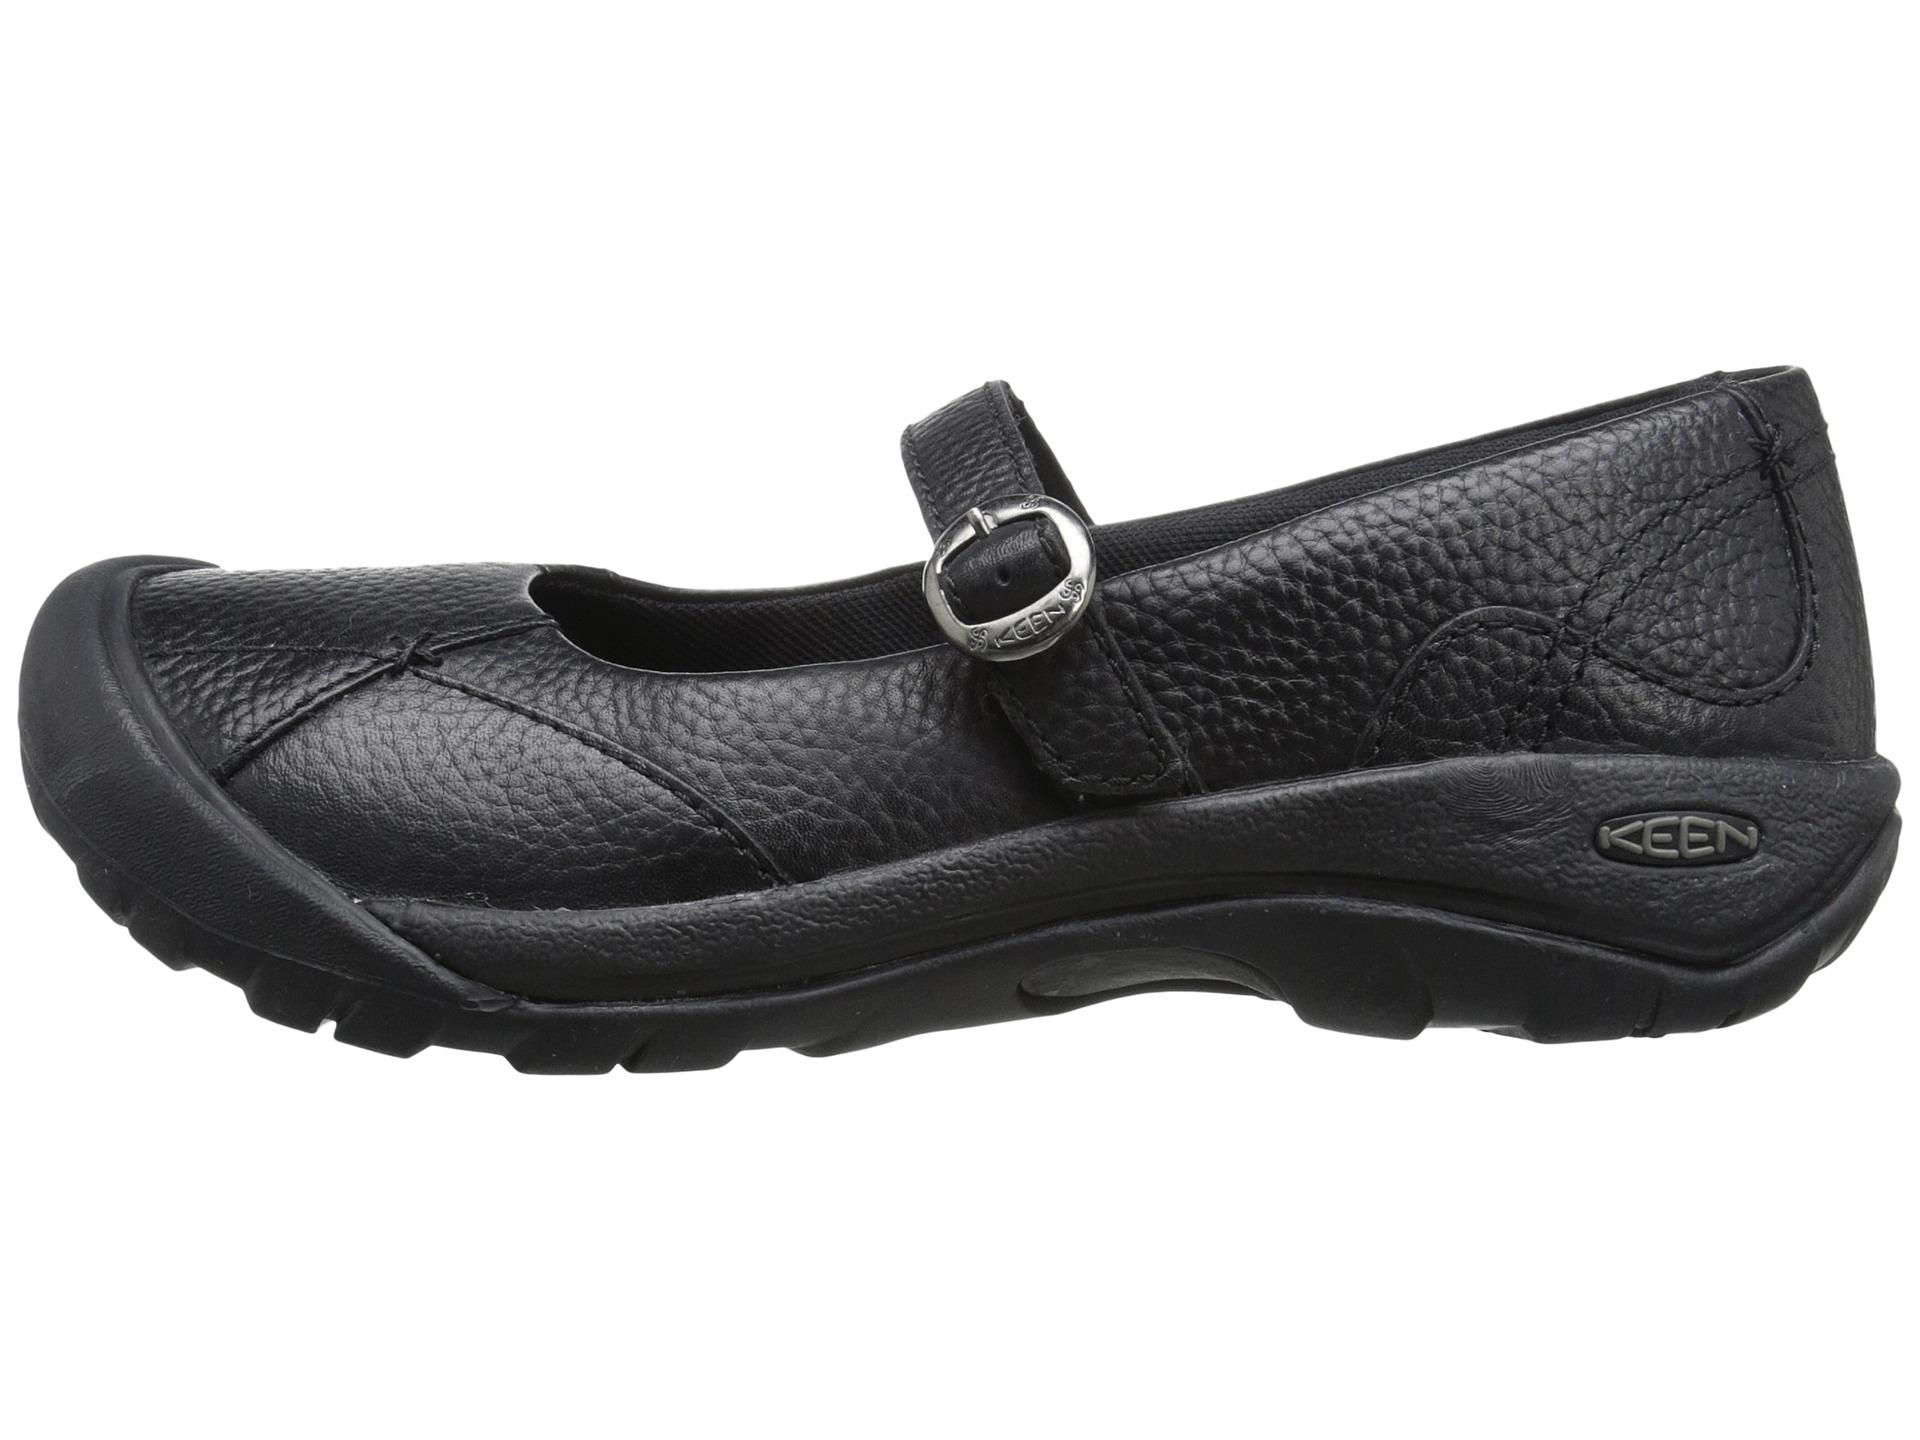 Keen Presidio Mj Shoes On Sale